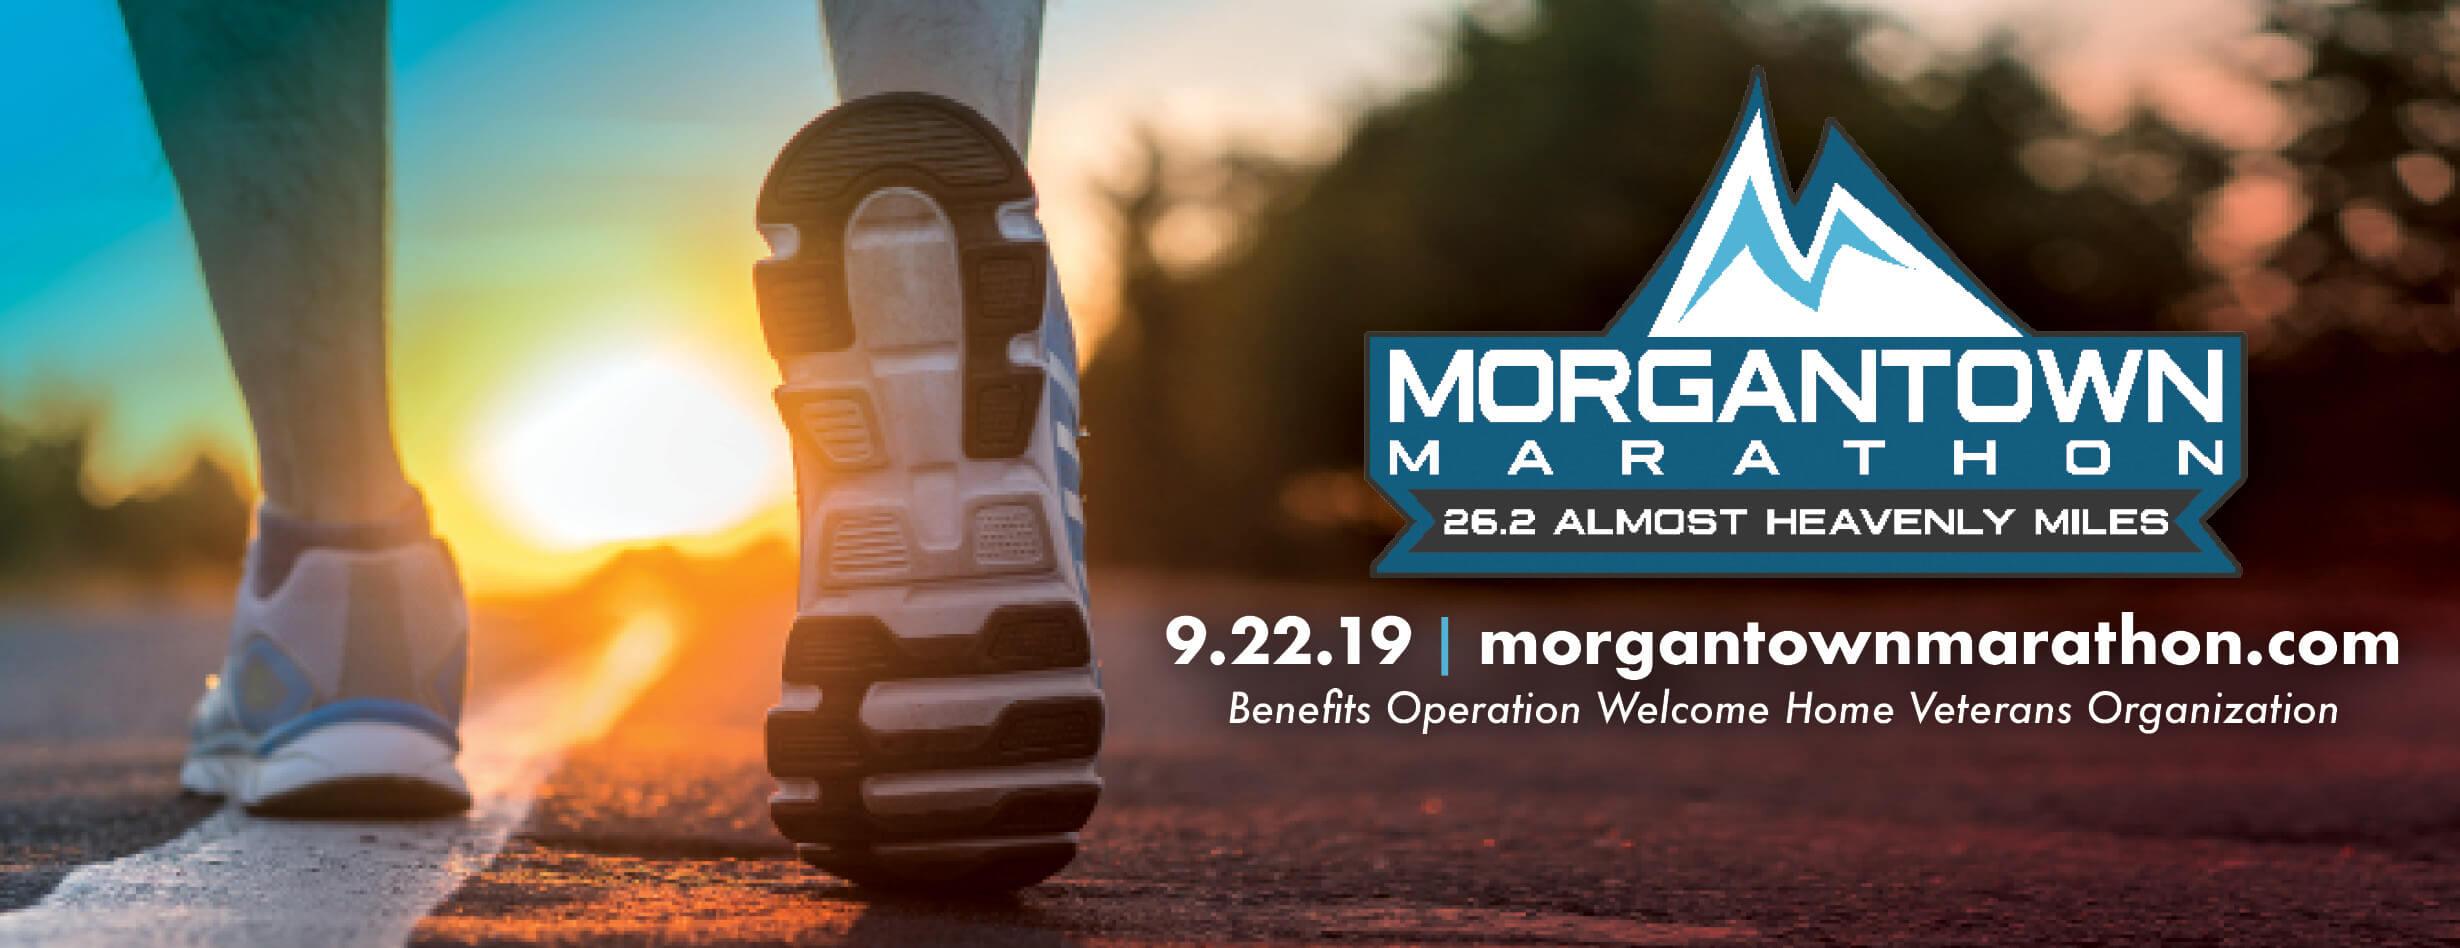 Morgantown Marathon 2019